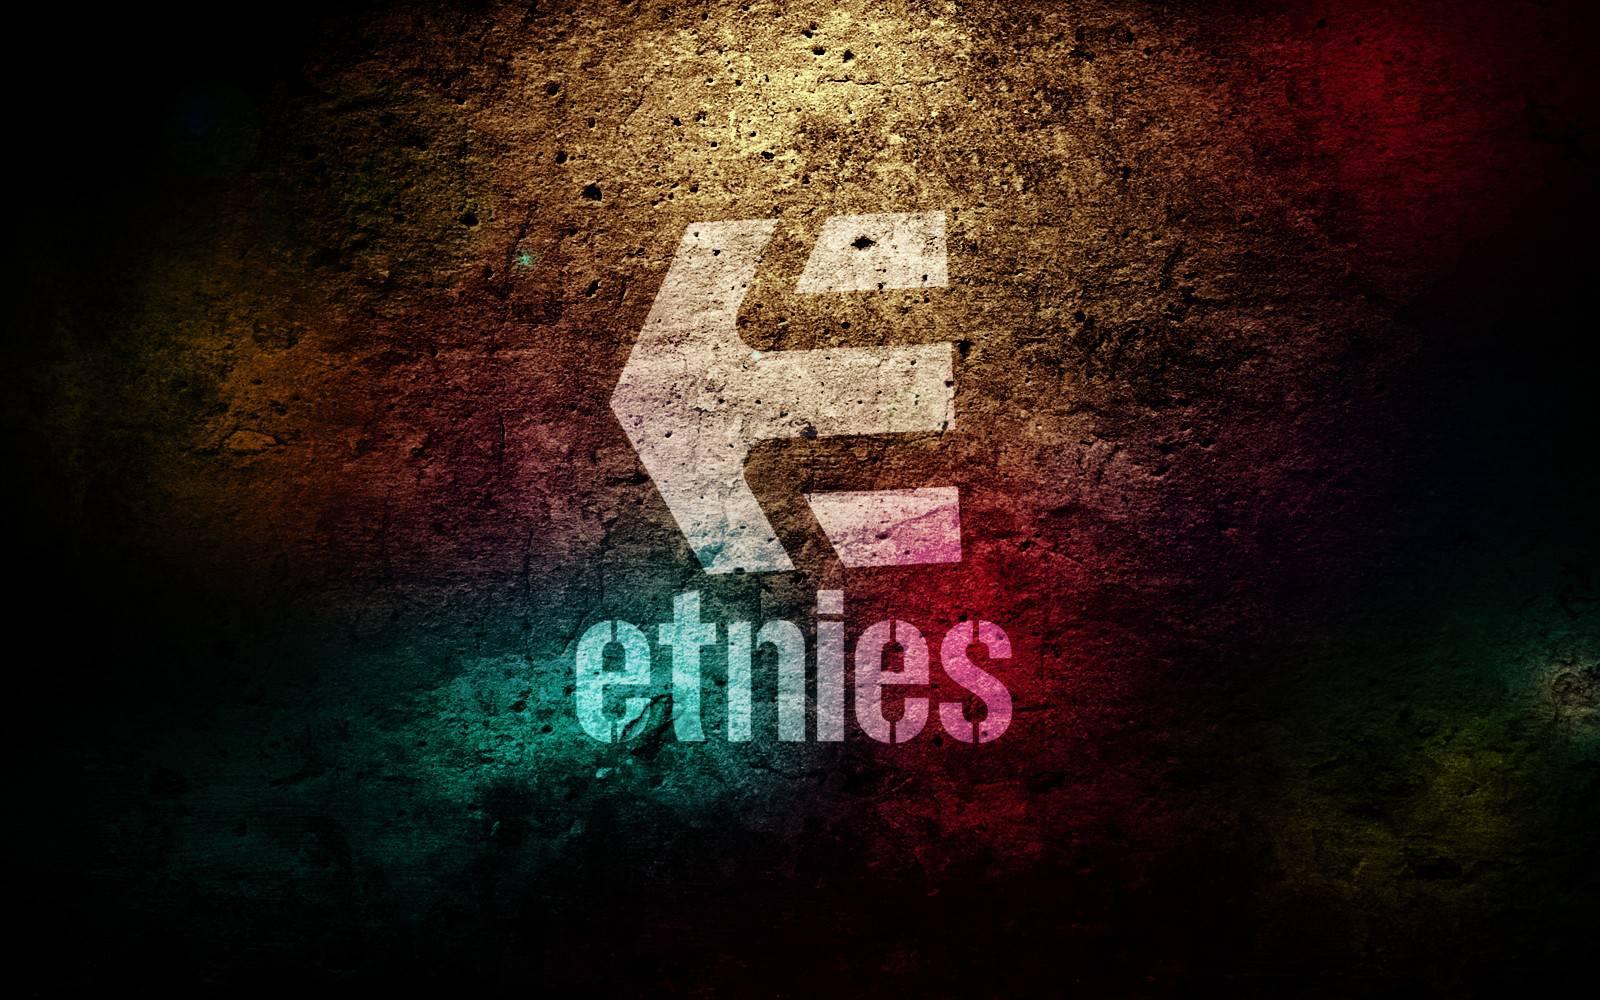 Etnies Skateboards Logo 1600x1000 for Desktop Wallpapers HD Background 1600x1000